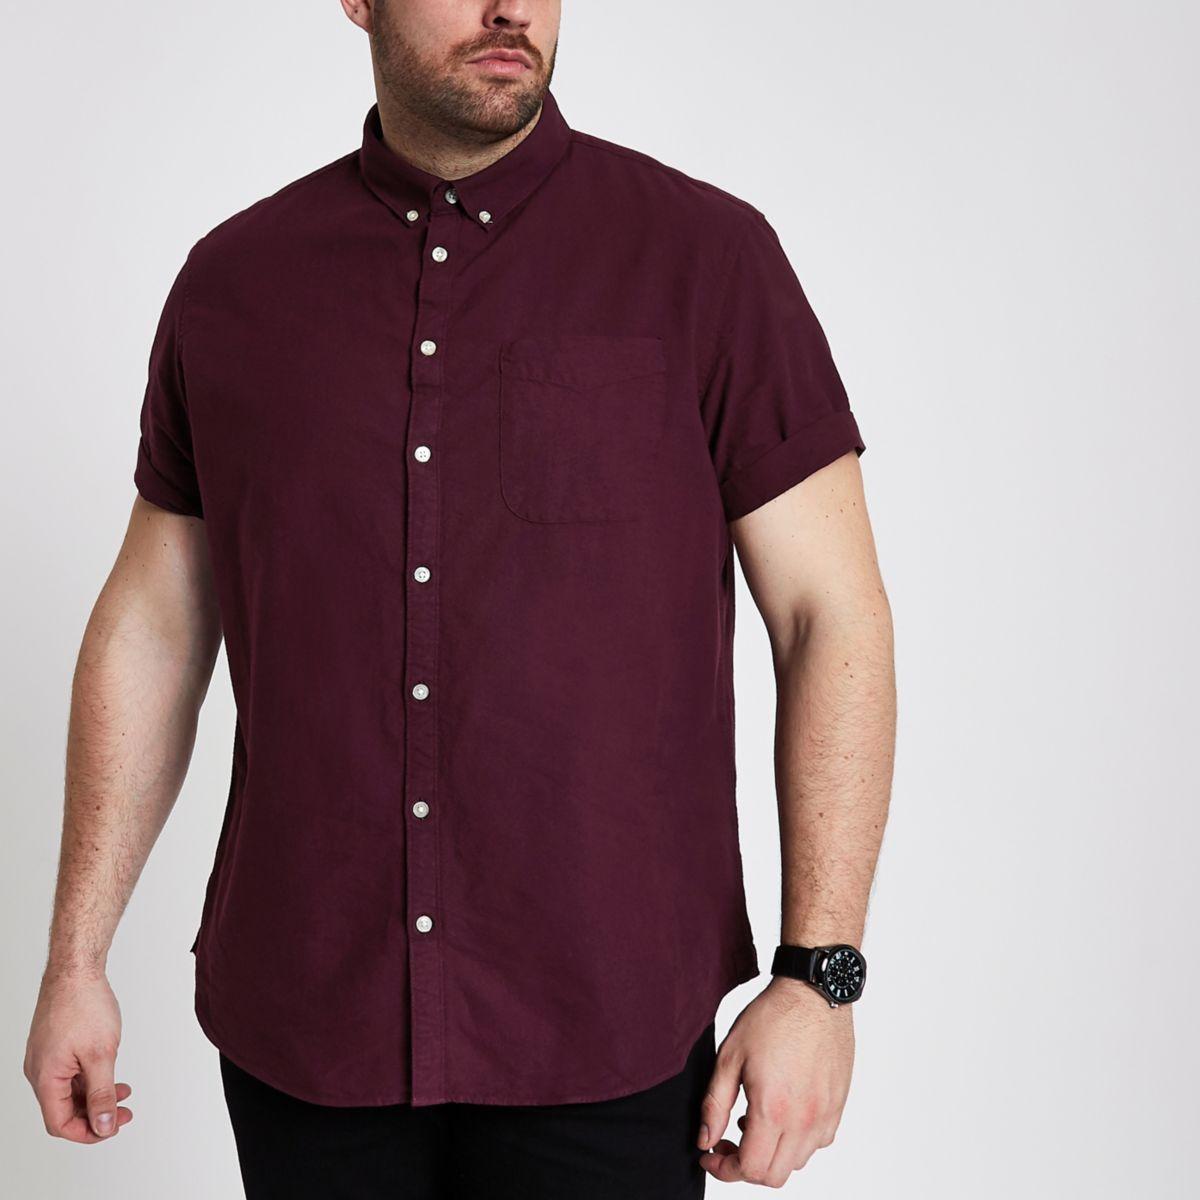 Big and Tall burgundy short sleeve shirt